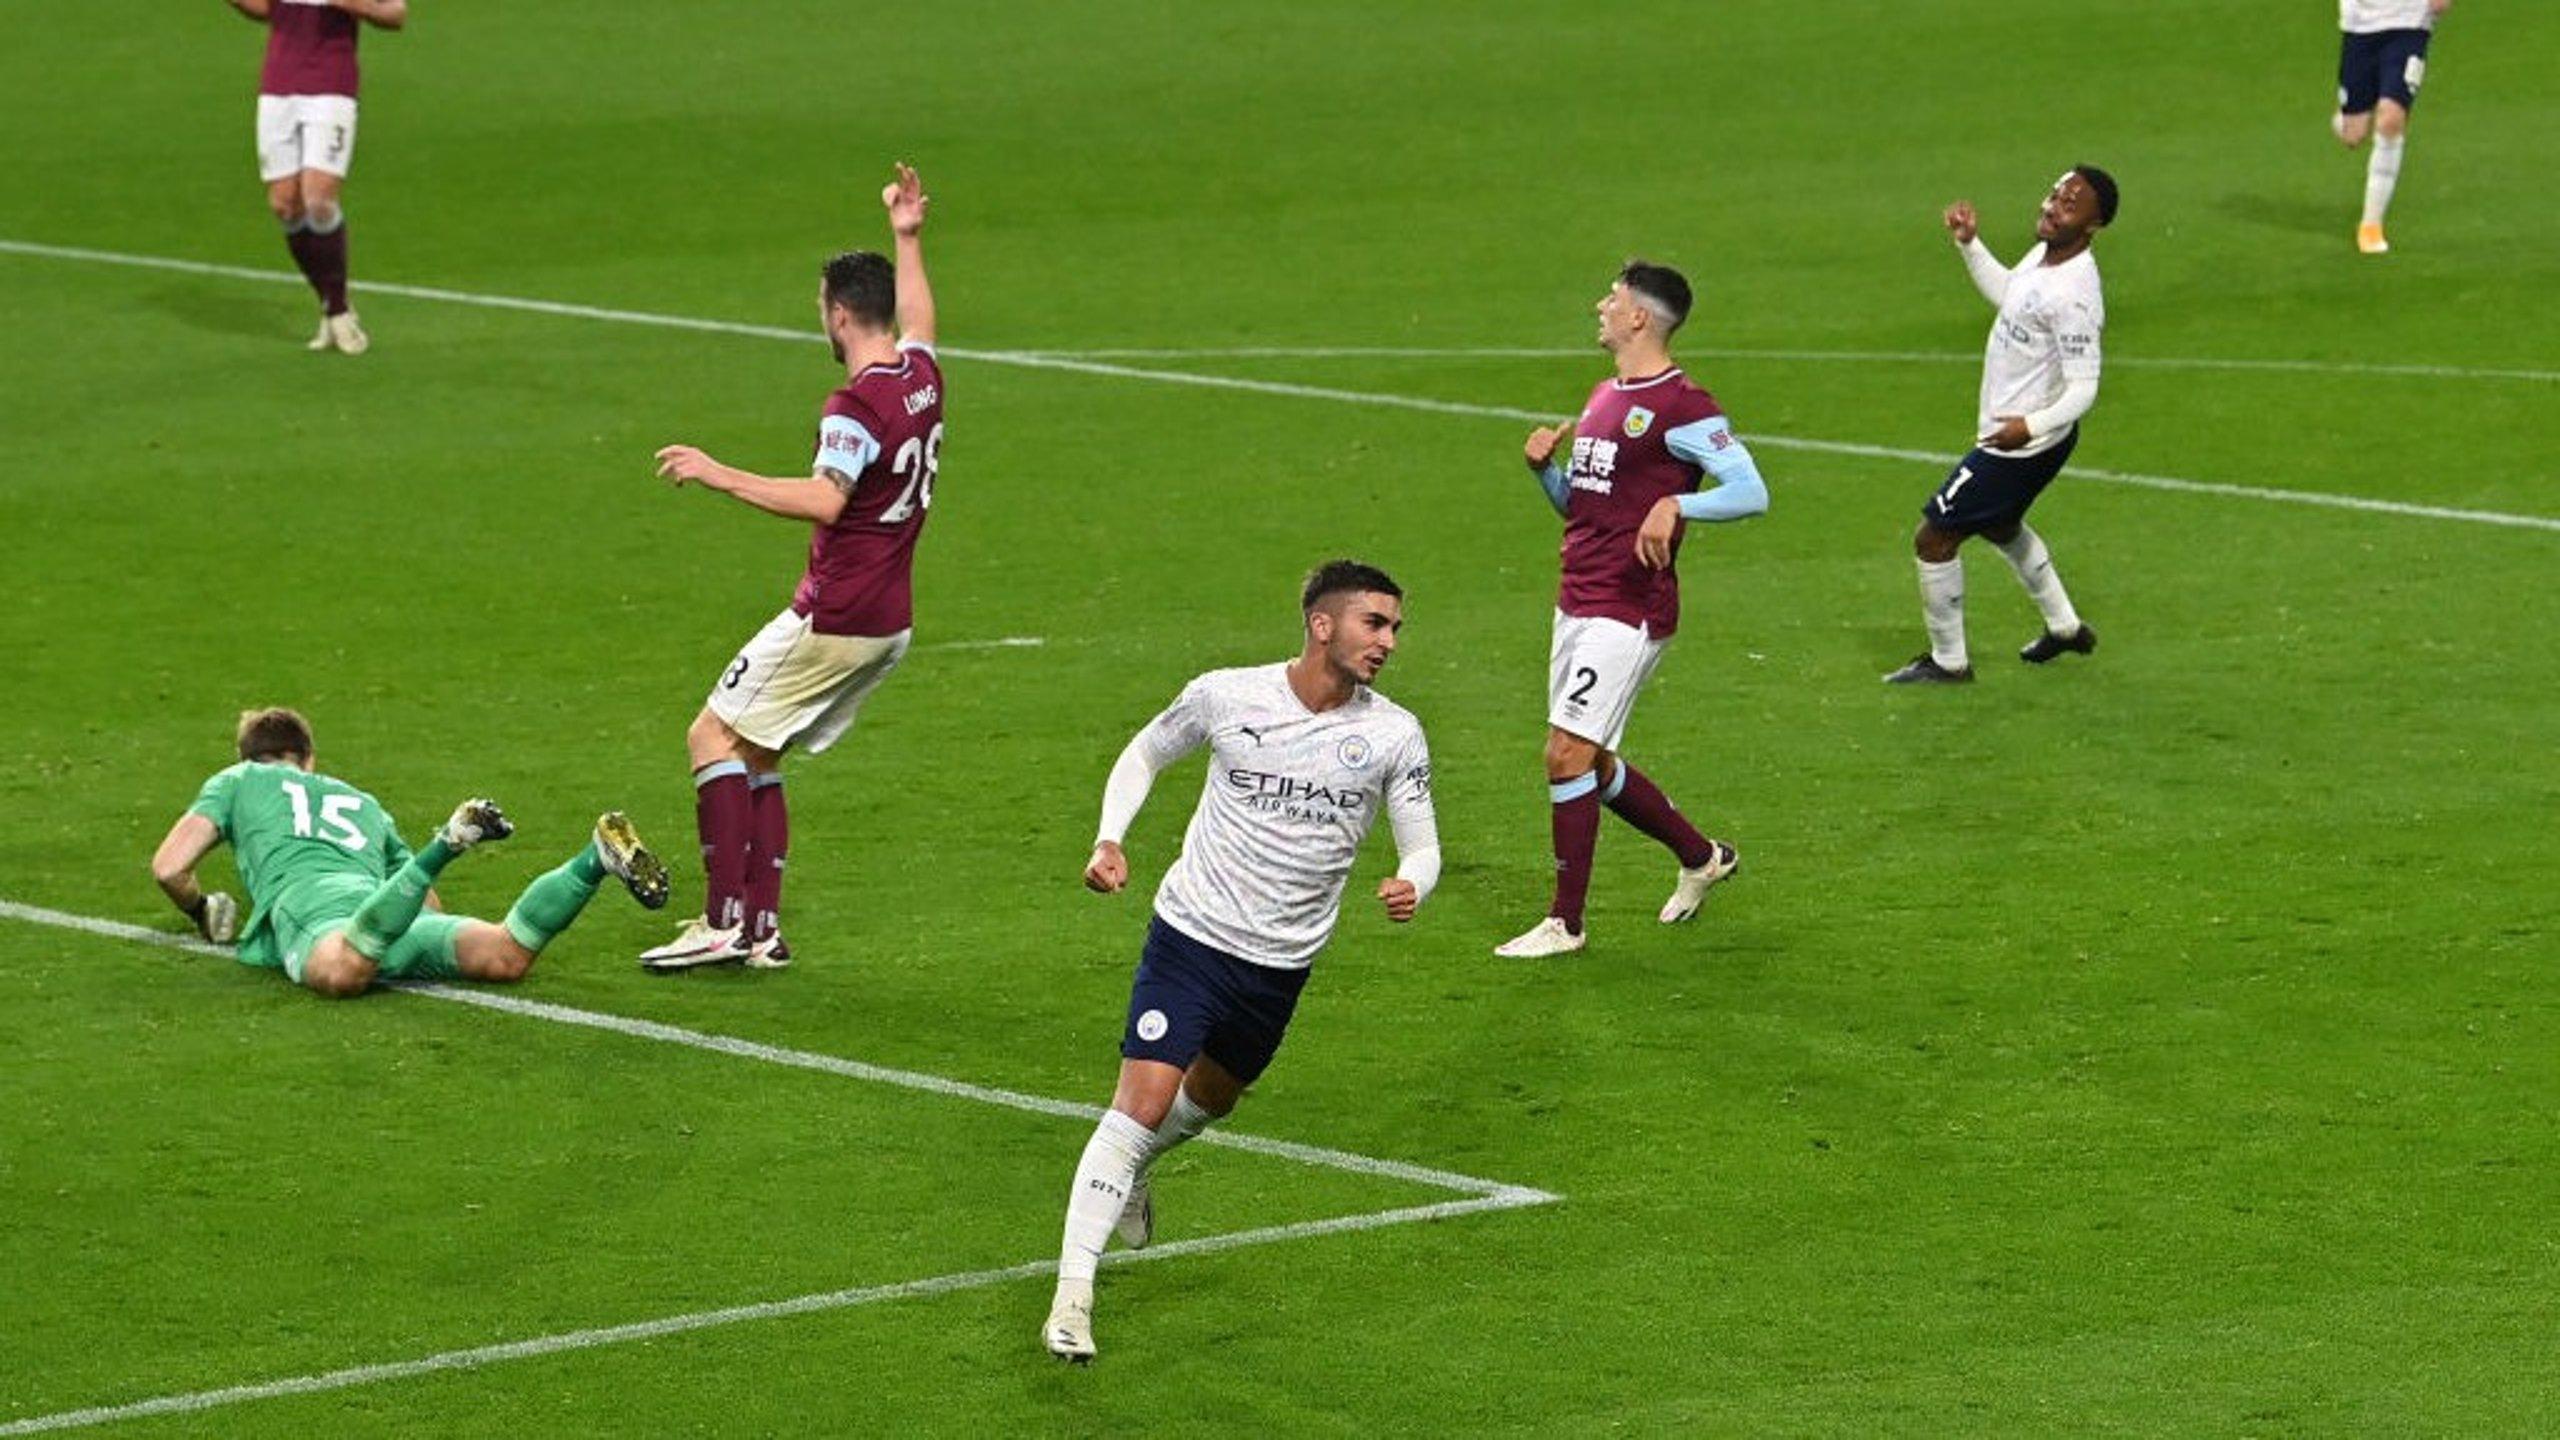 Gallery: Torres off the mark in comfortable win over Burnley